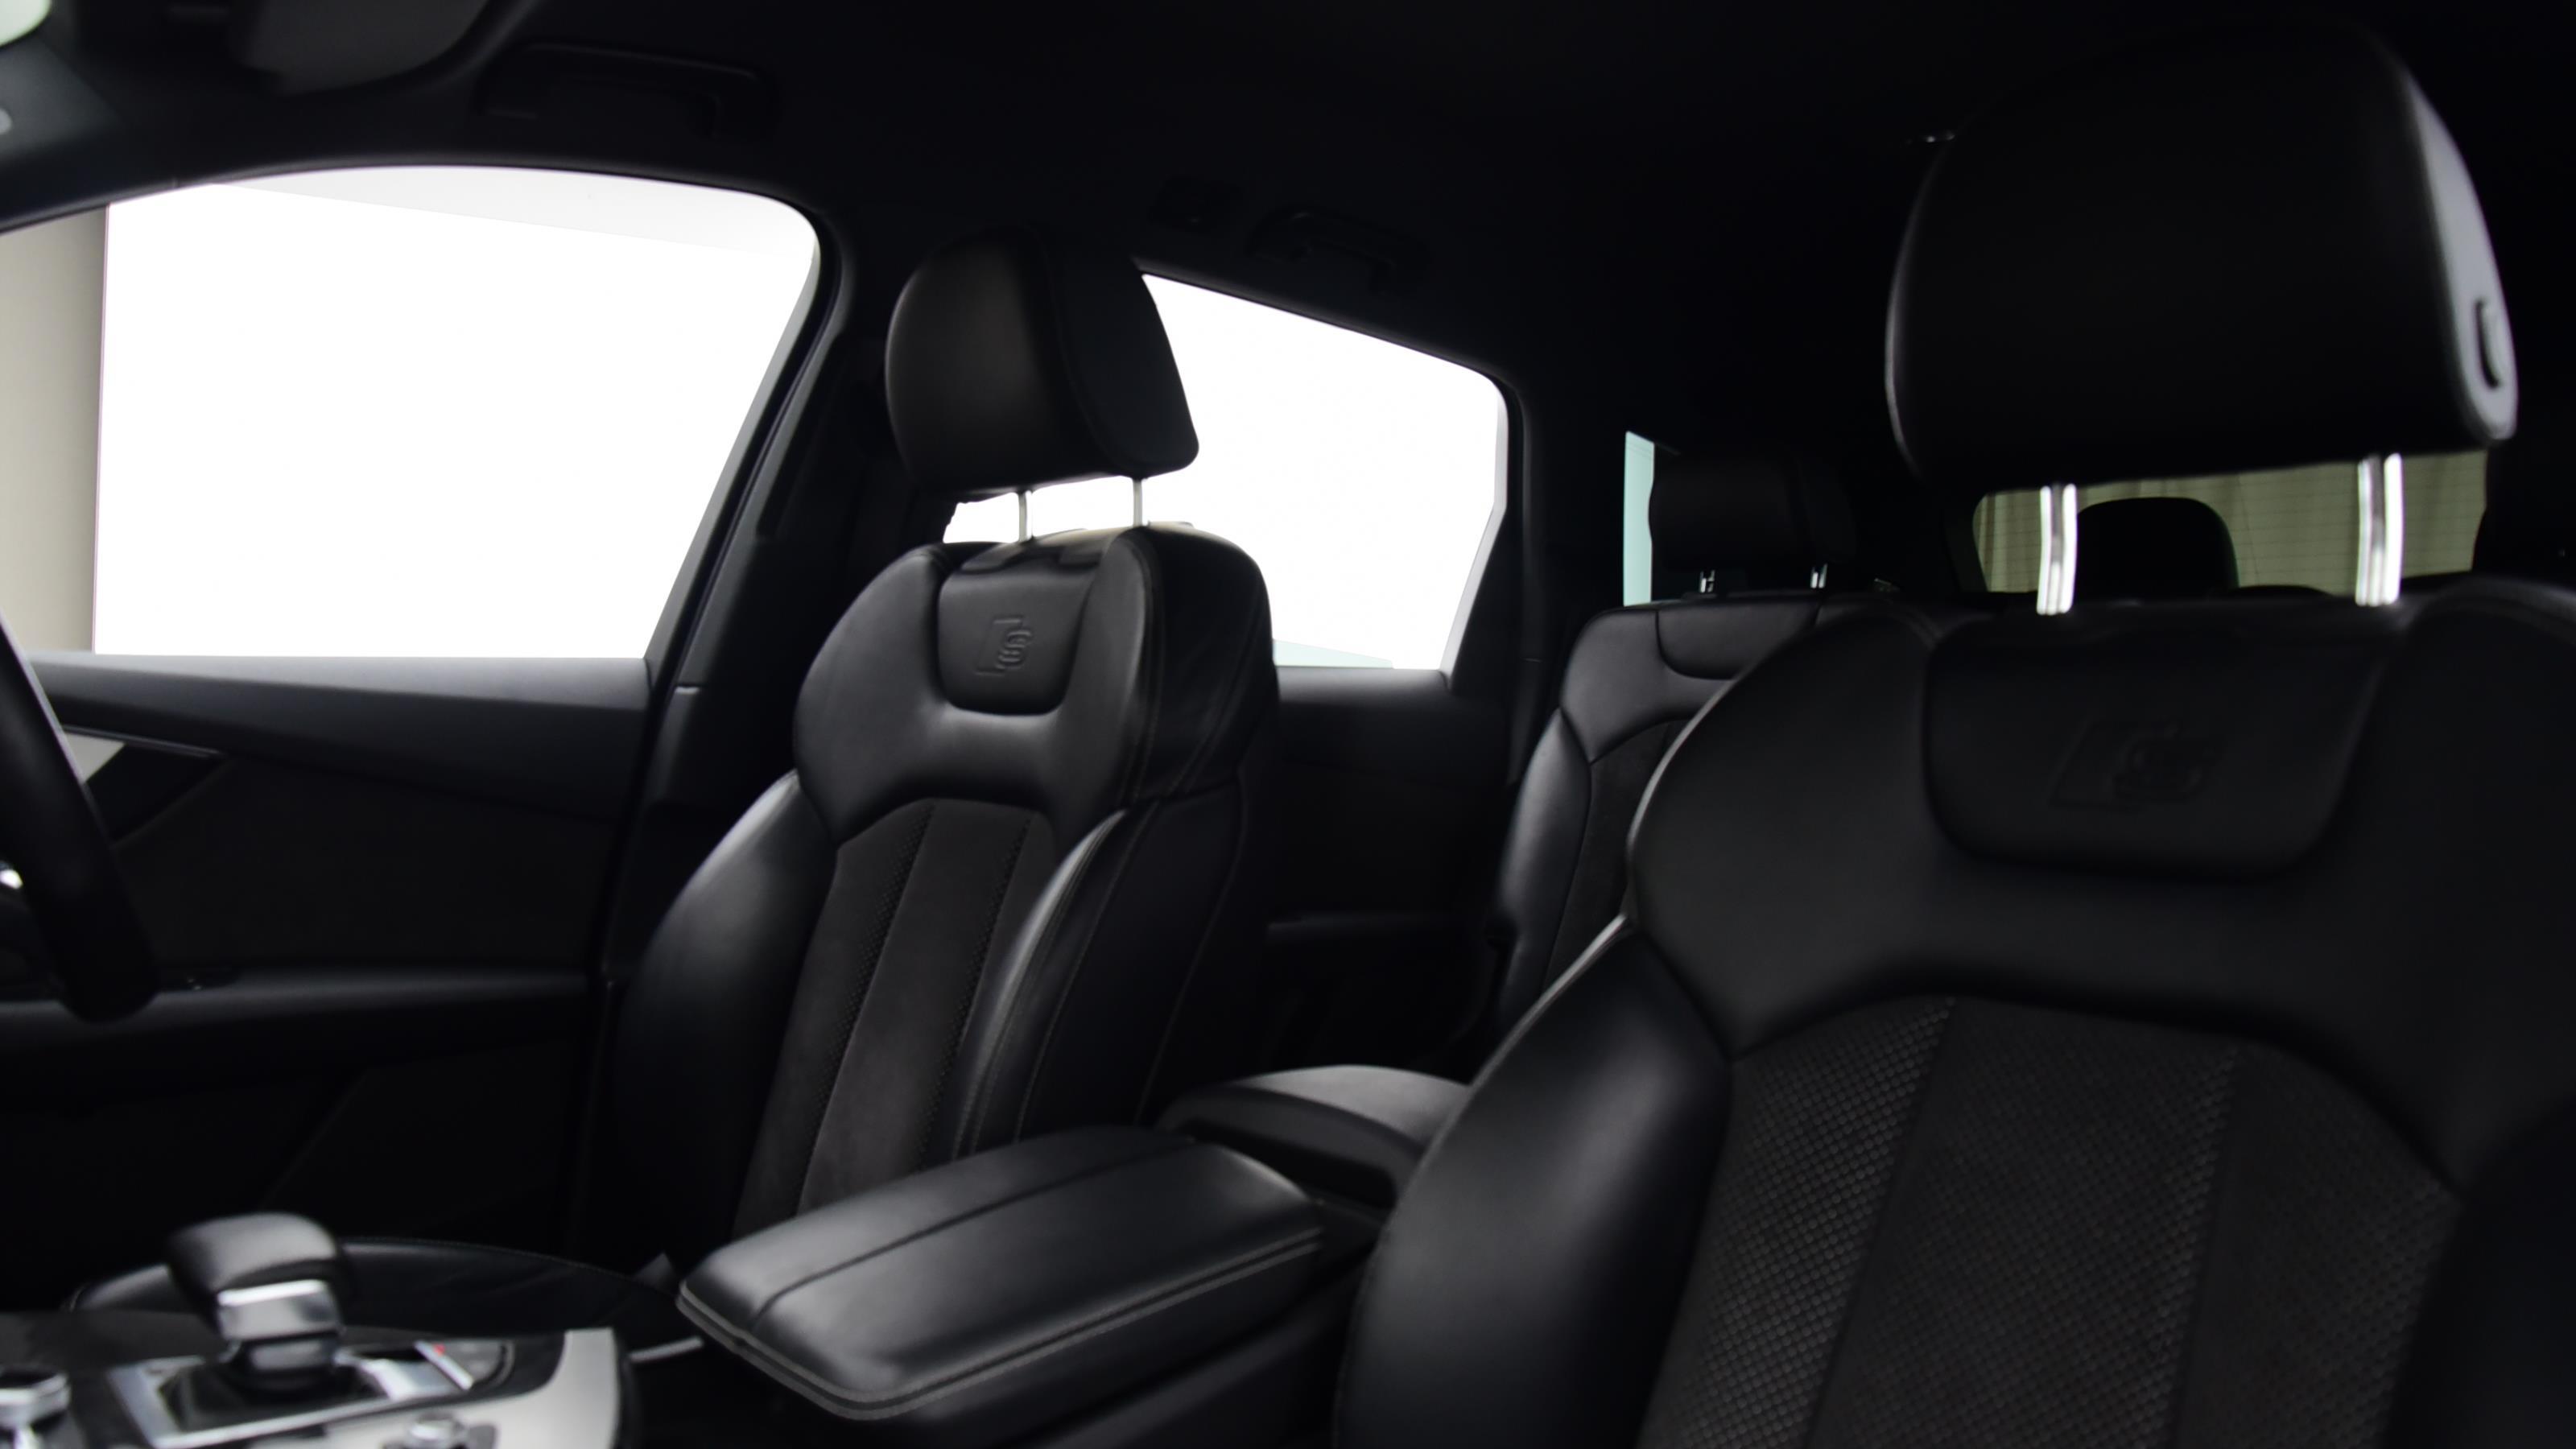 Used 2015 Audi Q7 3.0 TDI Quattro S Line 5dr Tip Auto BLUE at Saxton4x4